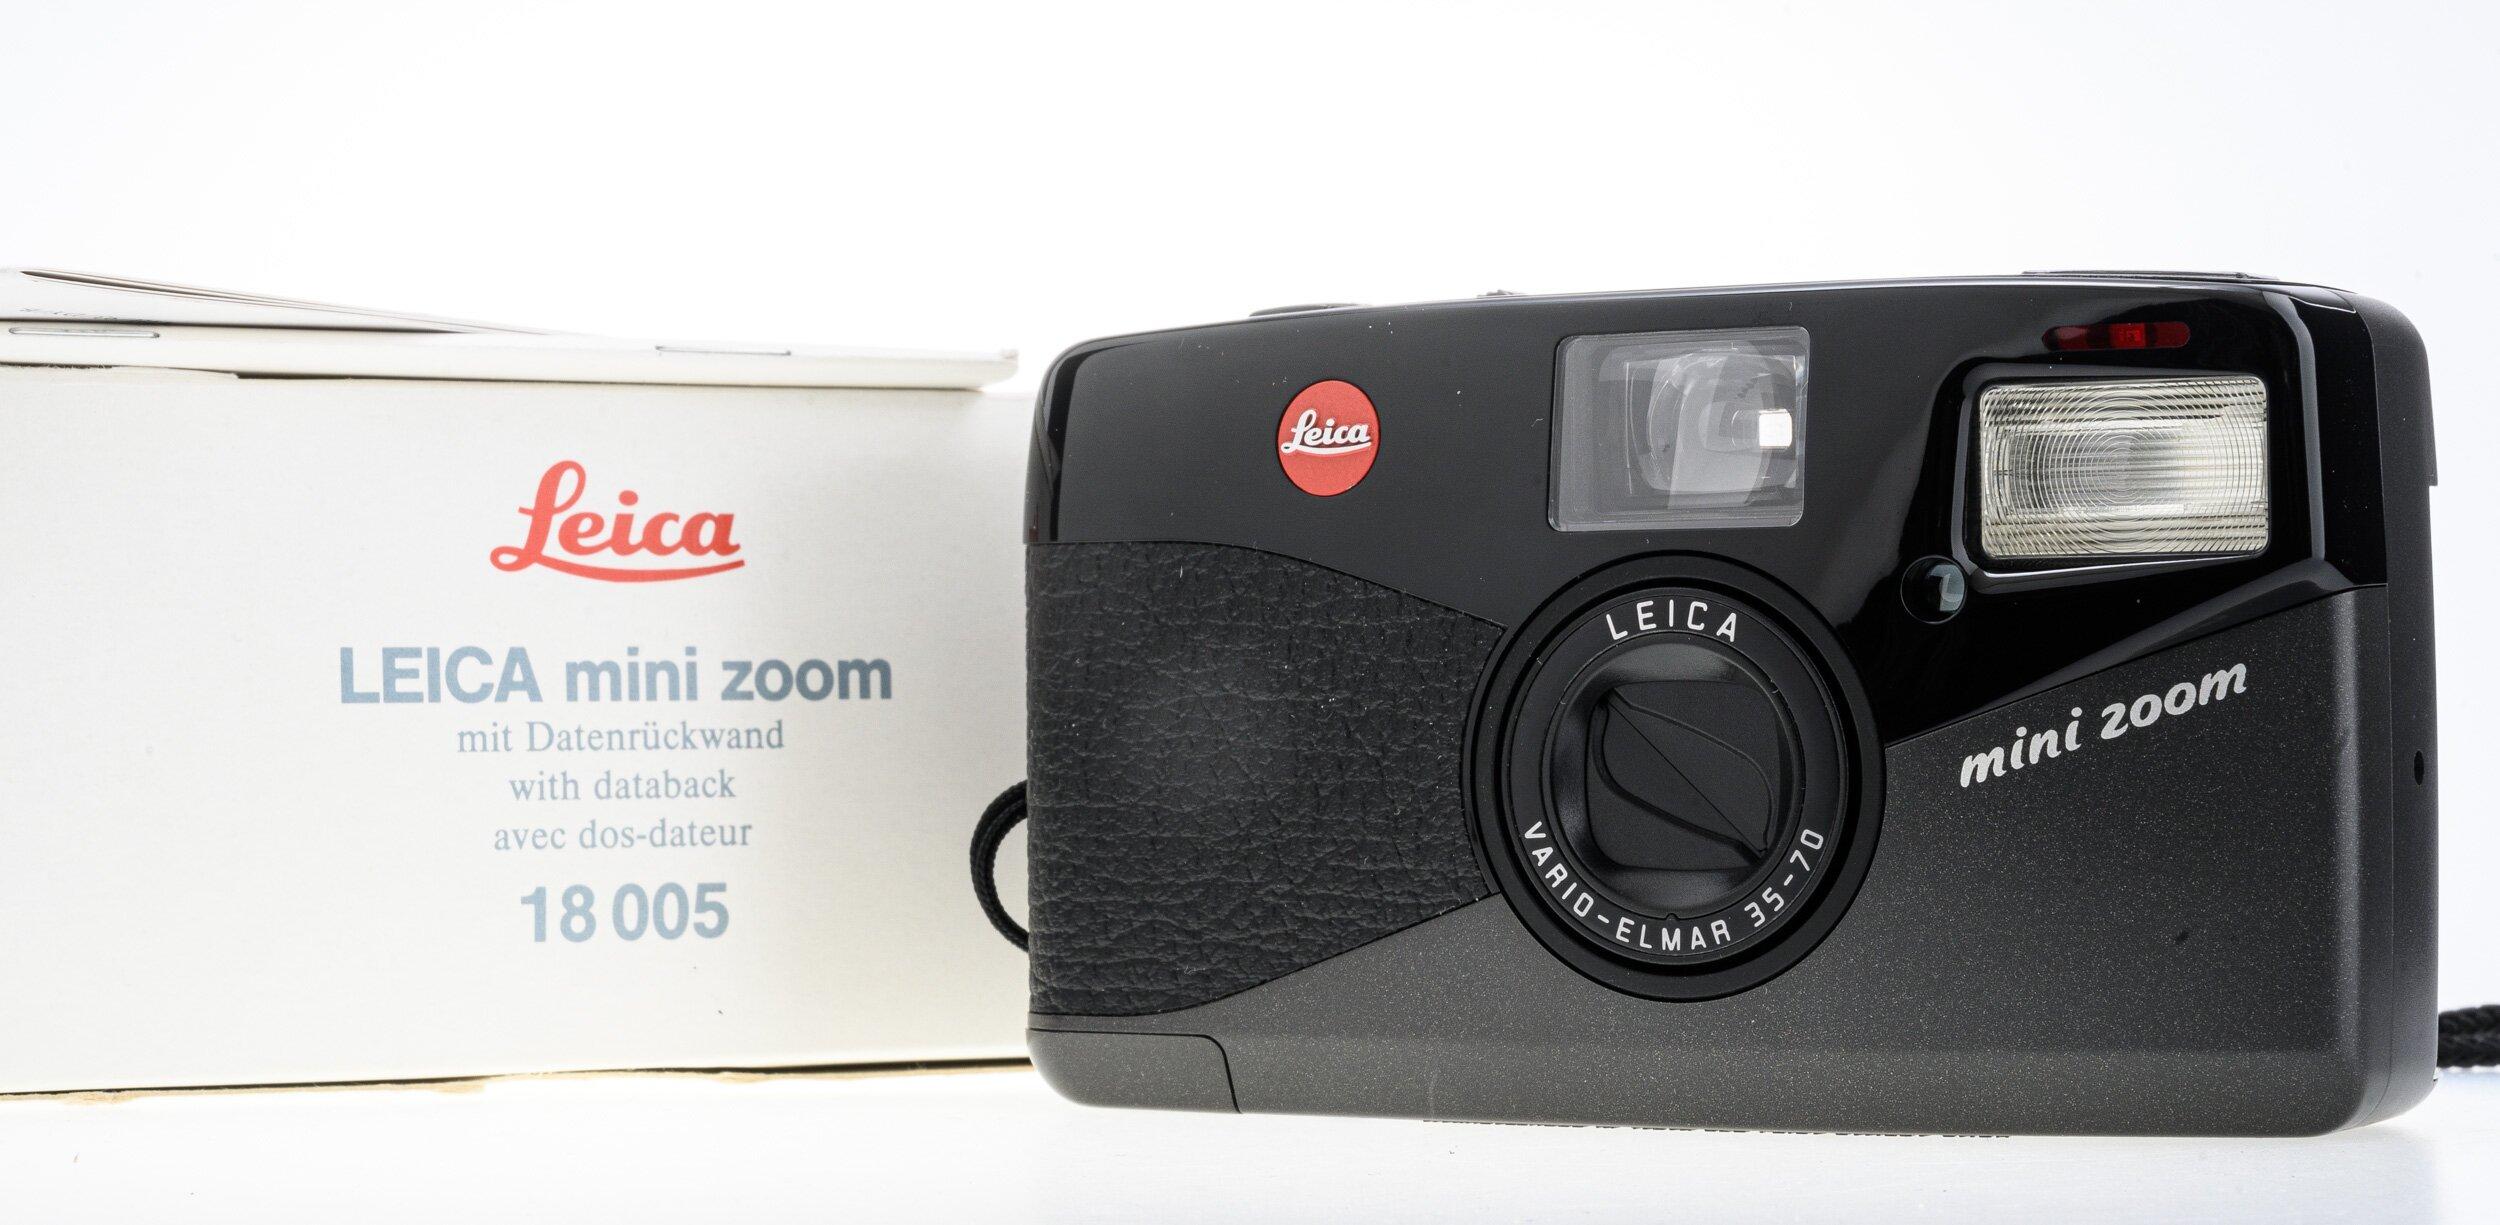 Leica mini zoom #18005